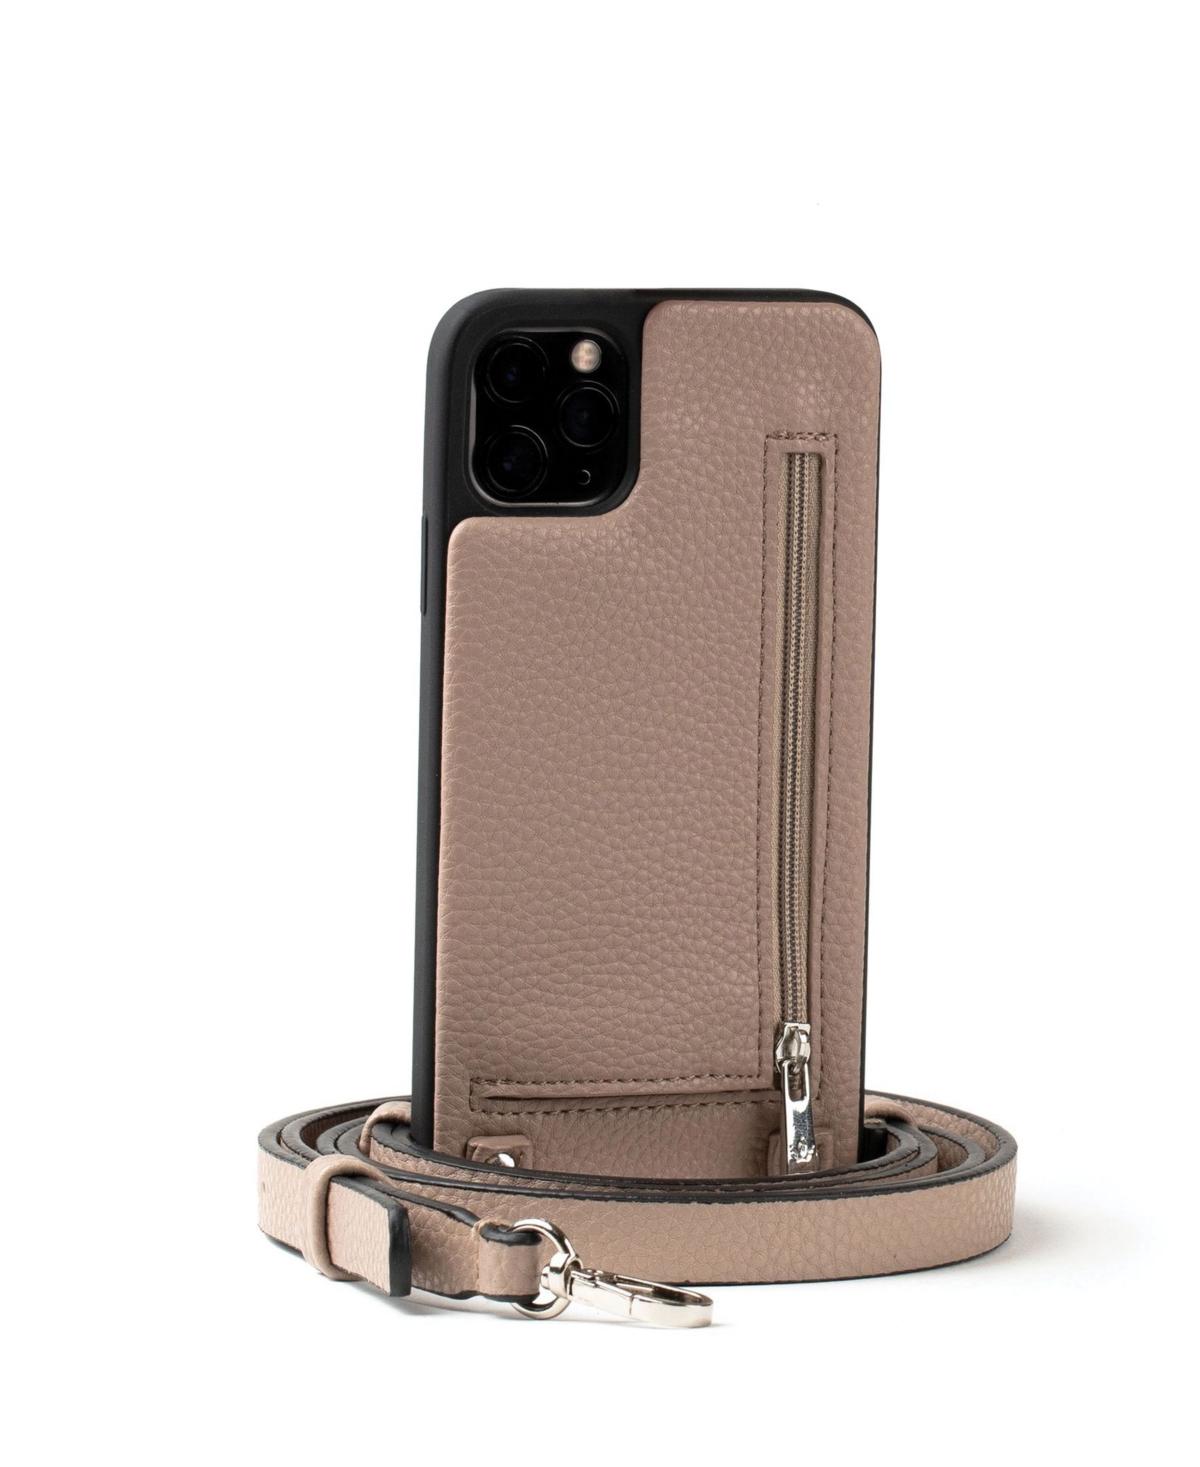 Hera Cases Jolene iPhone 12 Pro Max Cross Body Phone Case